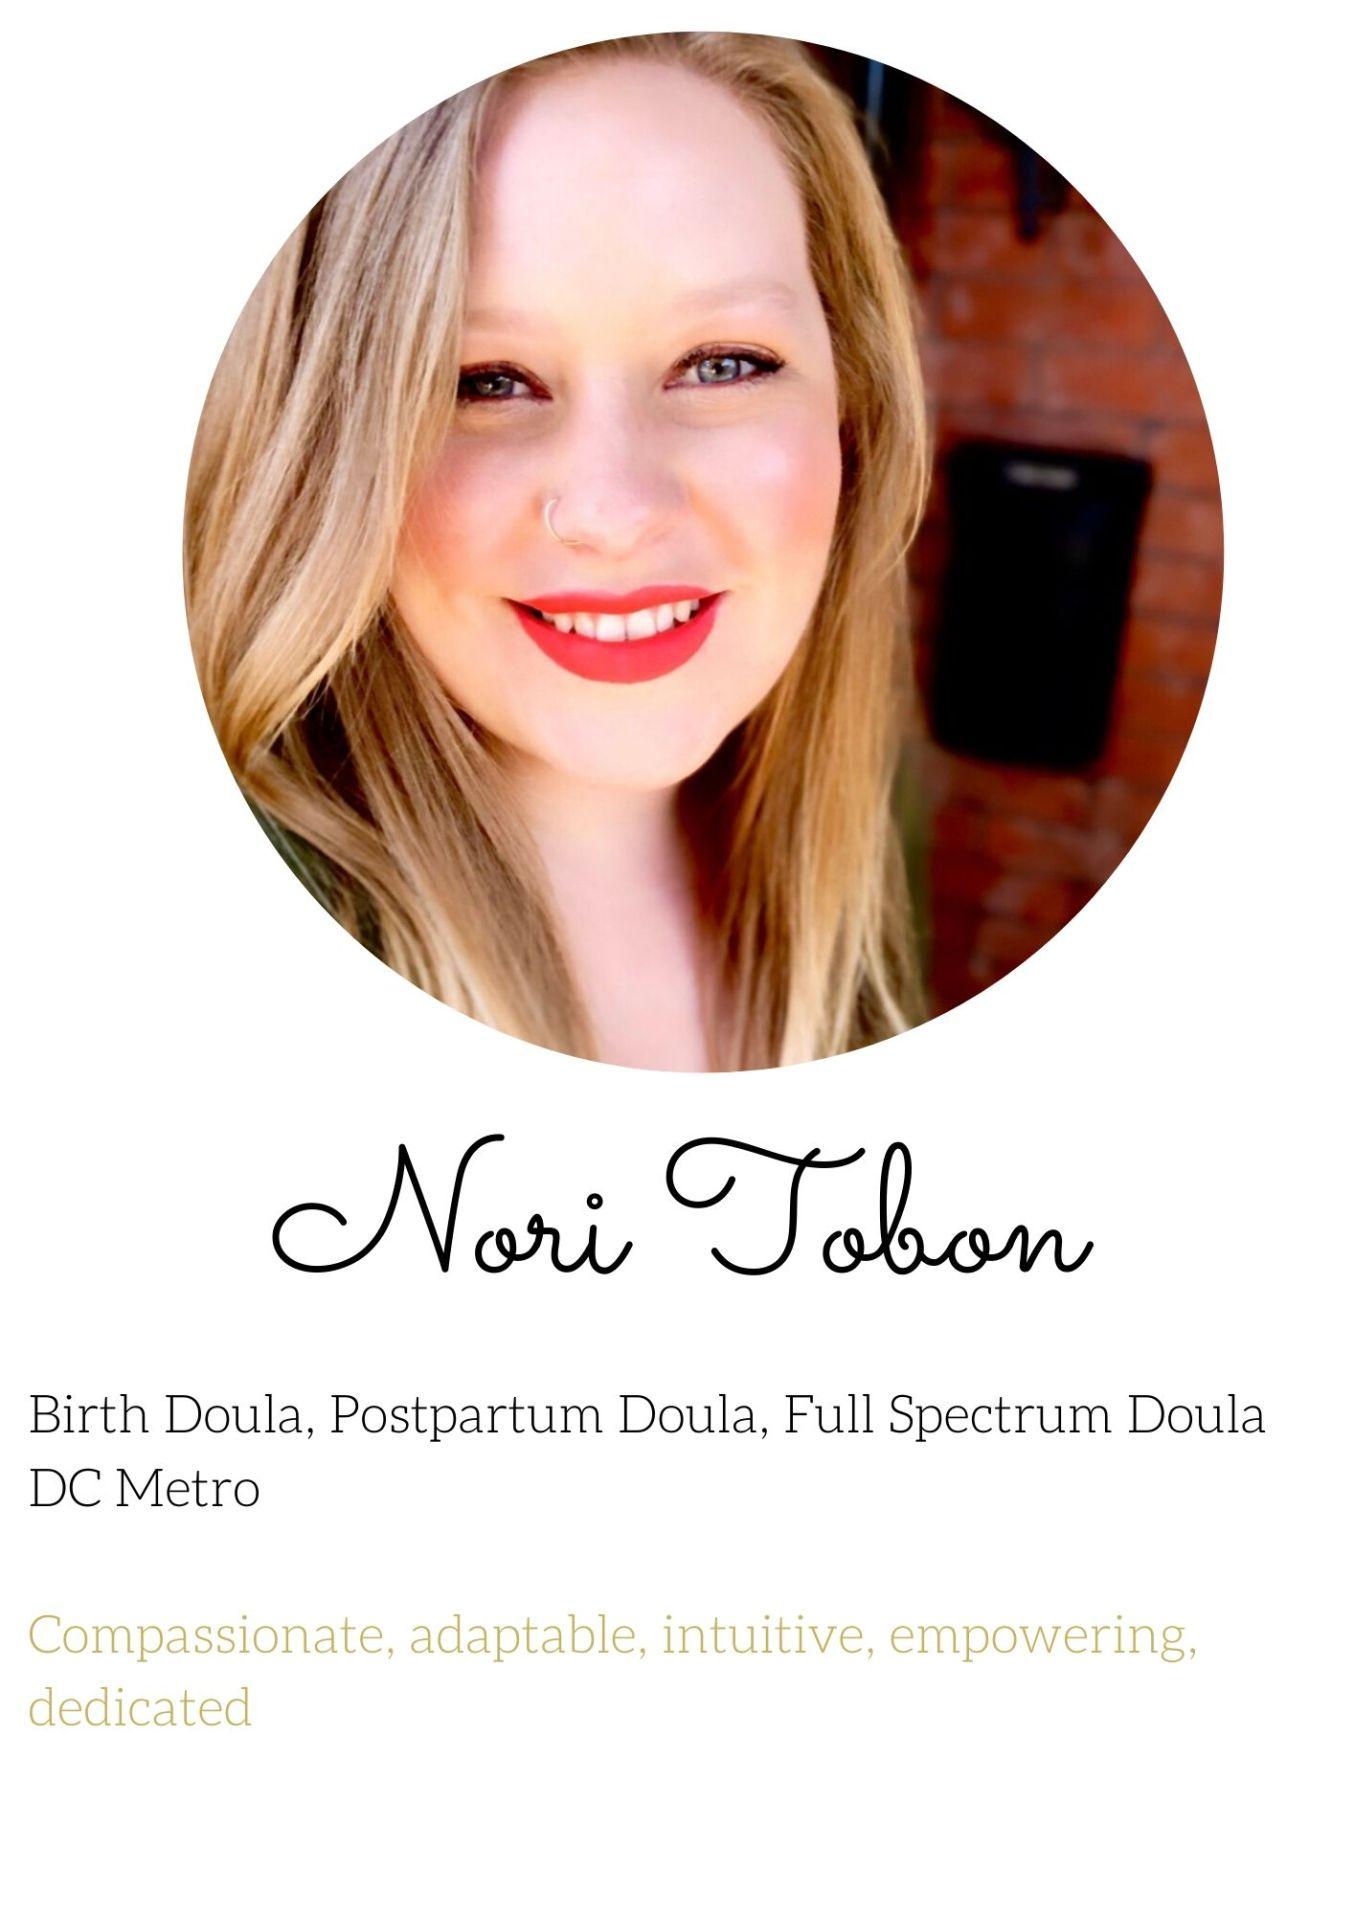 Nori  birth doula northern virginia experienced dc